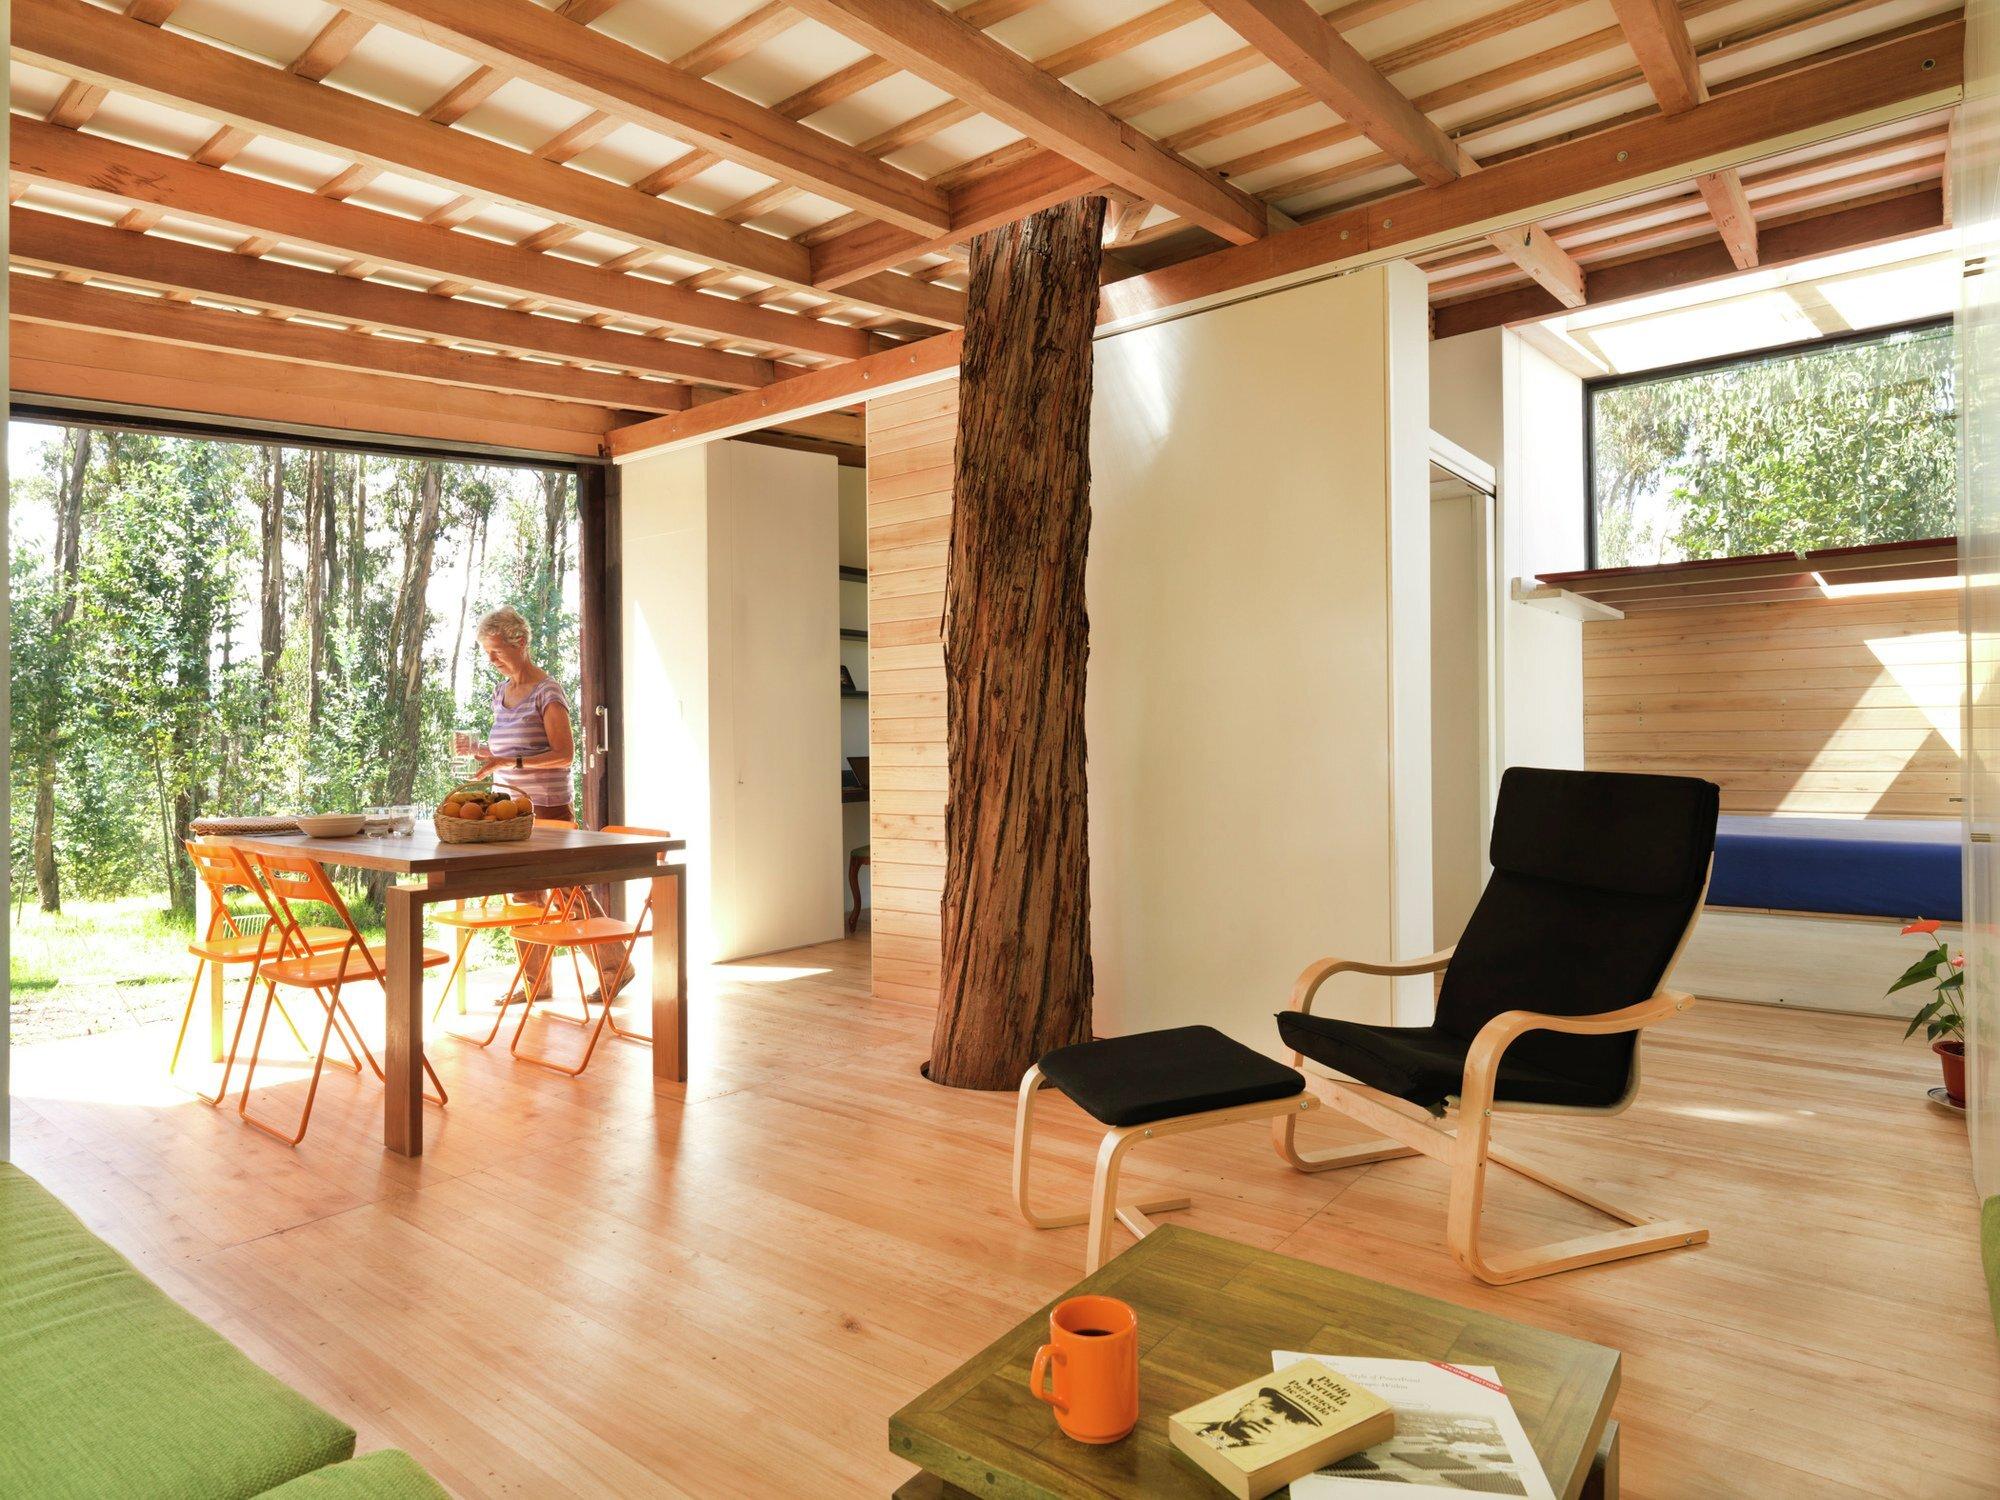 House Prototype - Luis Roldan Velasco + Ángel Hevia Antuña - Ecuador - Living Area - Humble Homes